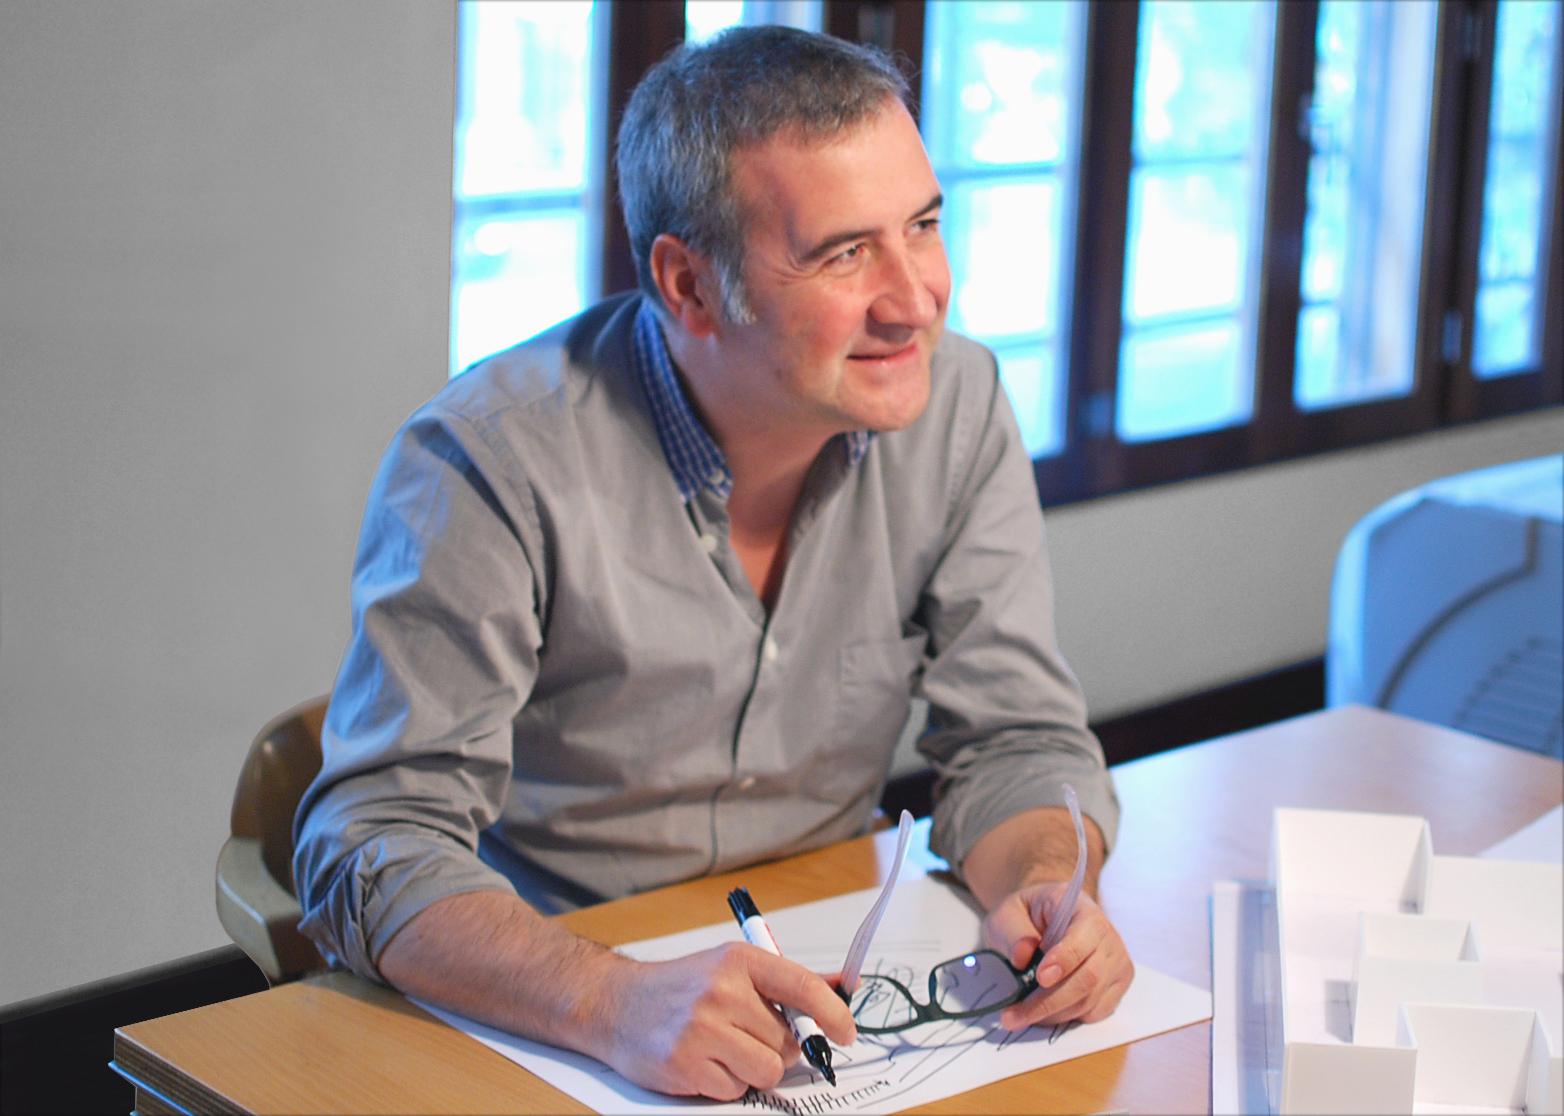 Carlos Salazar Fraile